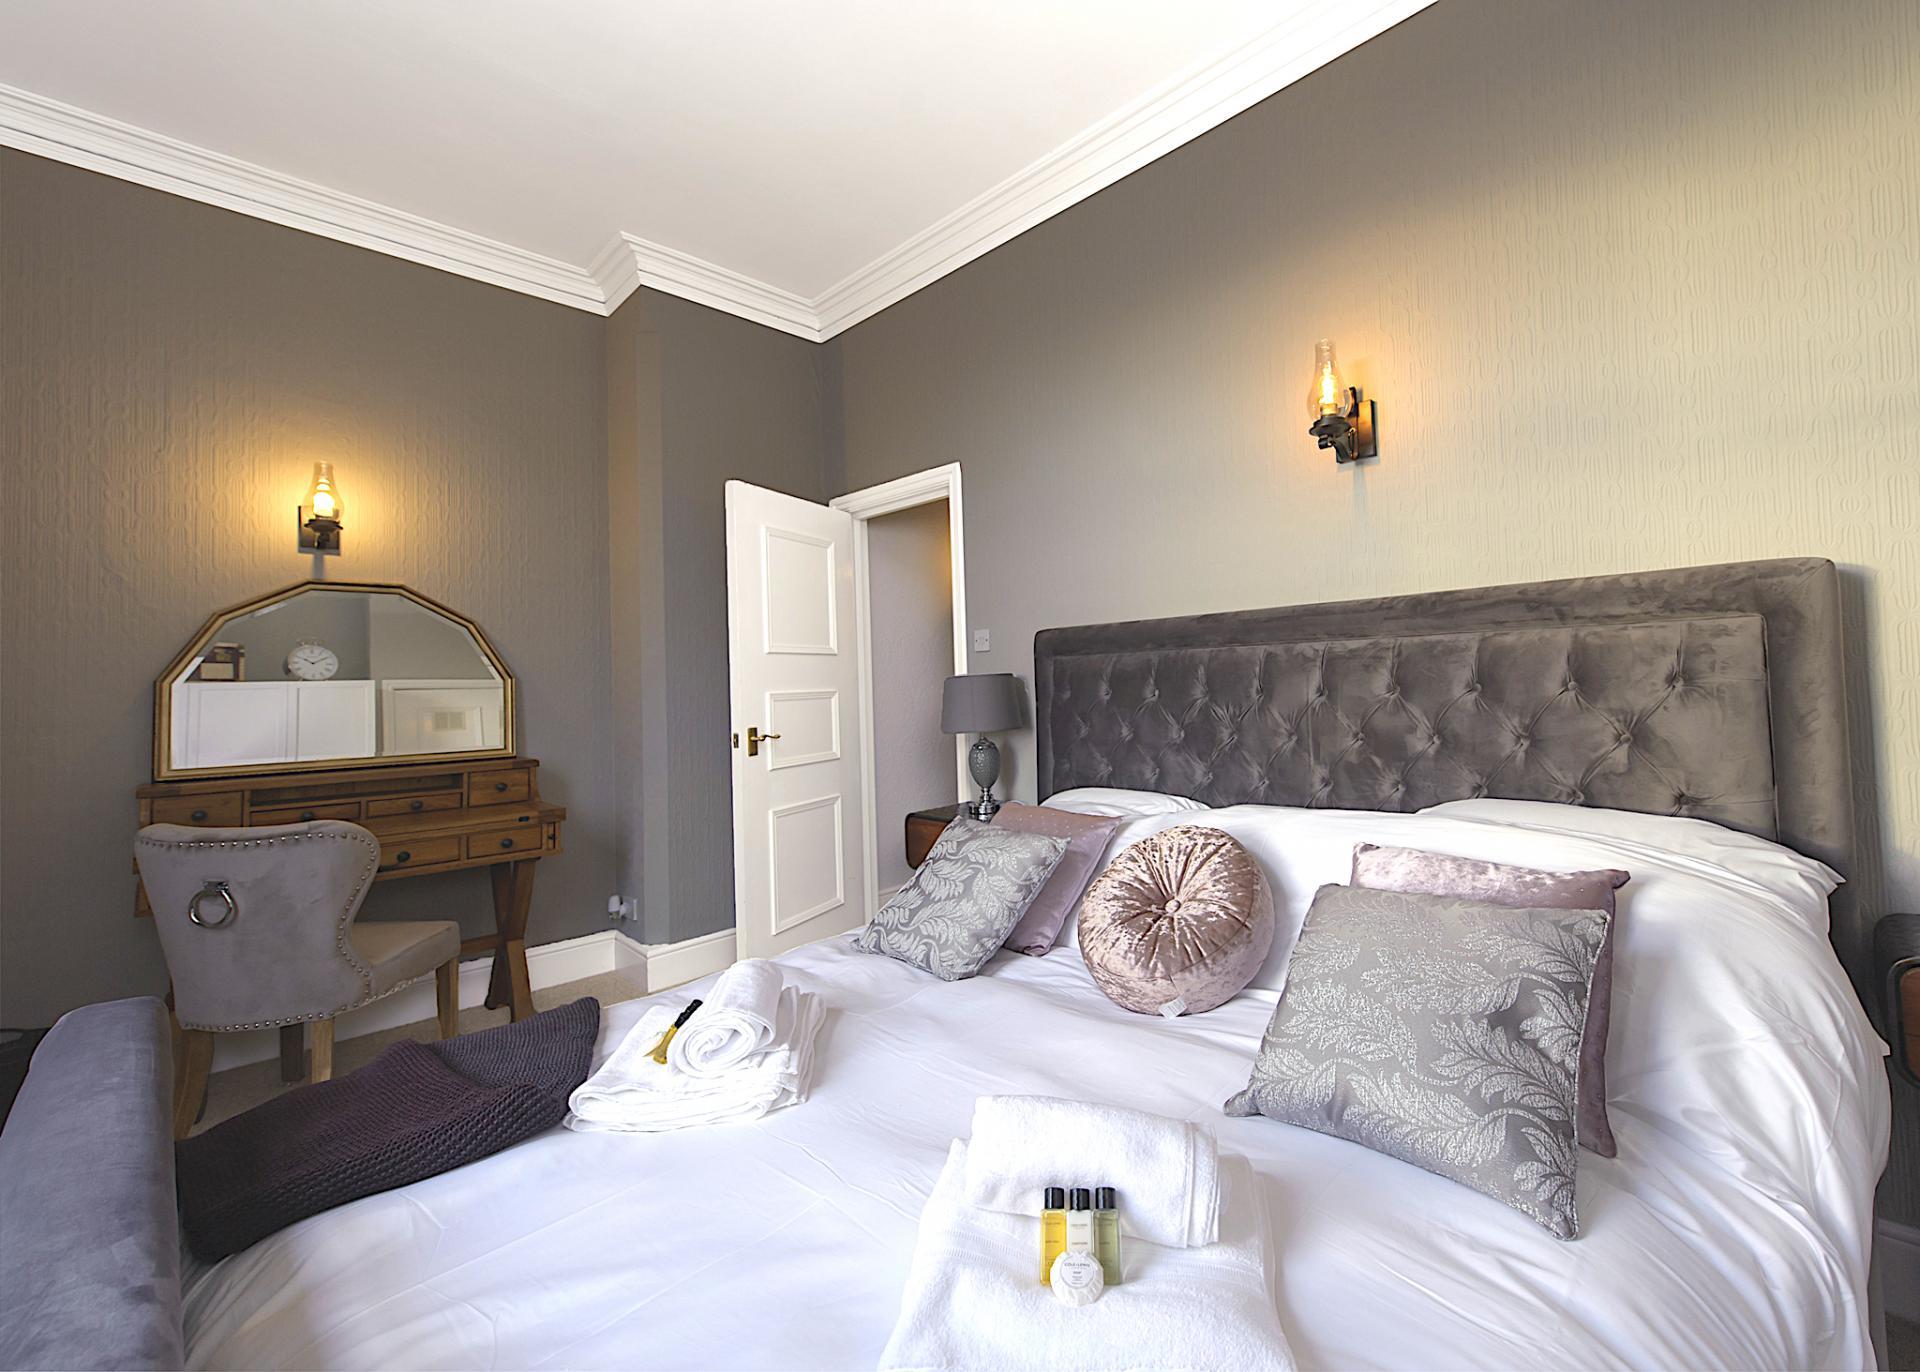 Super king size bed at Nottingham Park View Apartment, Centre, Nottingham - Citybase Apartments